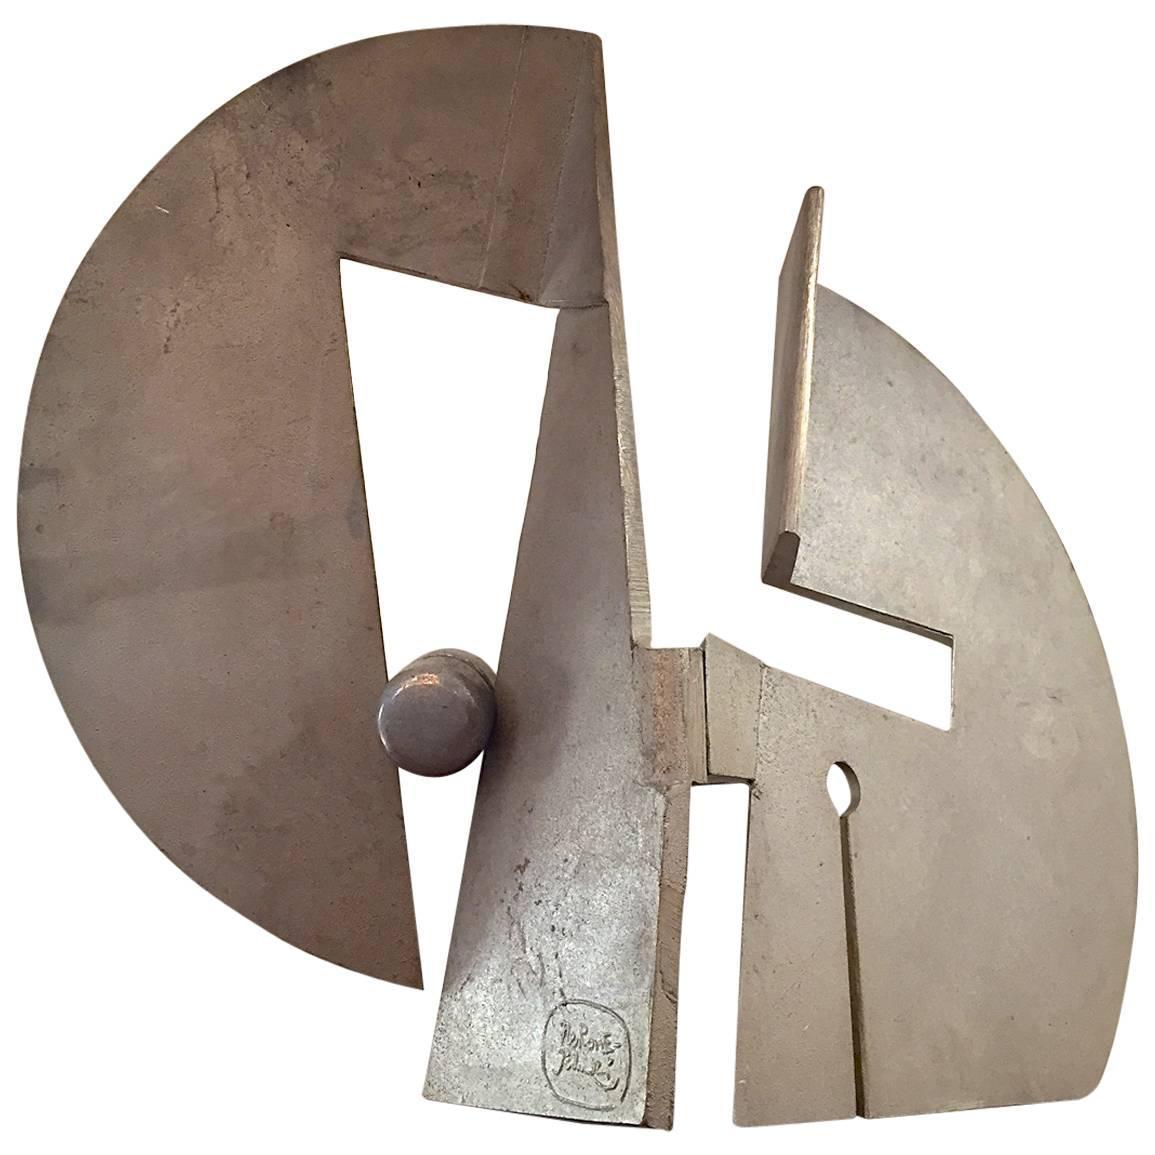 Giuseppe Nerone and Gianni Patuzzi Sculpture, 1970